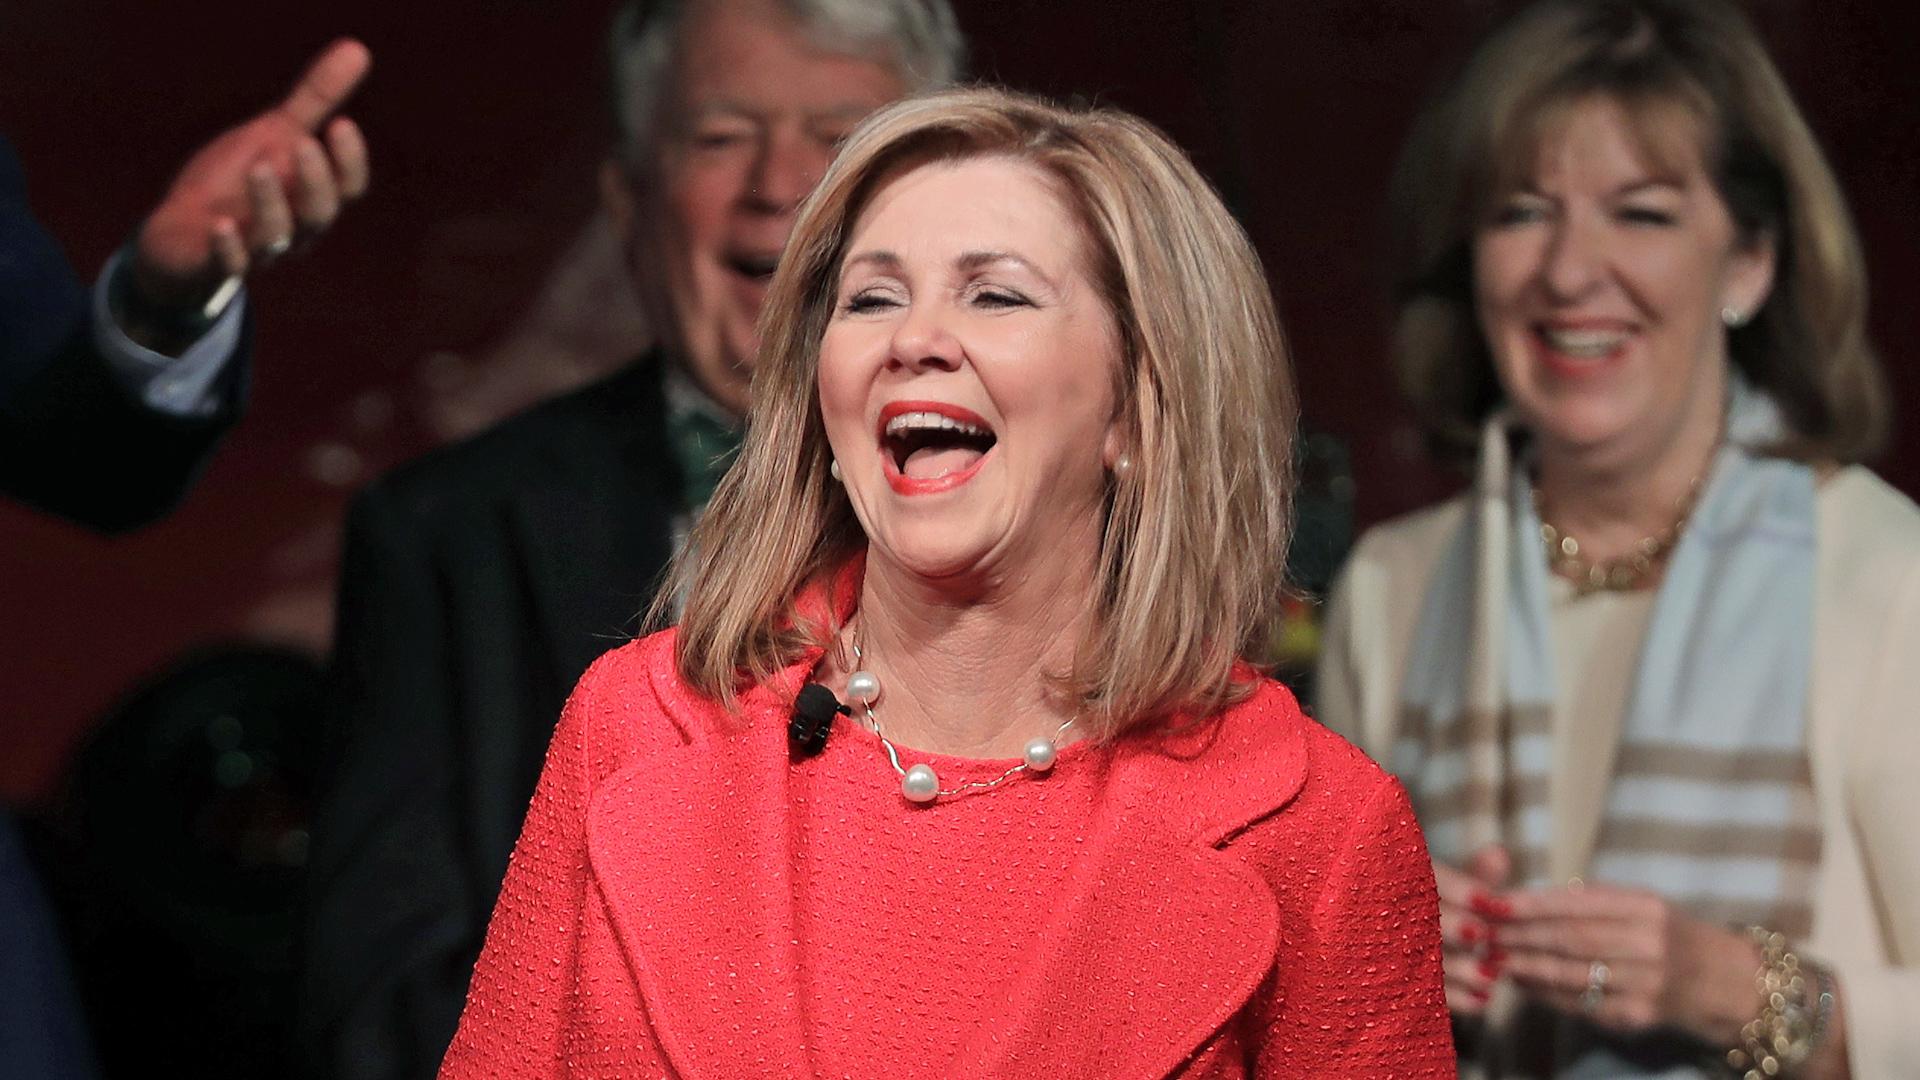 Marsha Blackburn Says Jesus Warned Against Lawyers. It Was Shakespeare Warning About Kings.